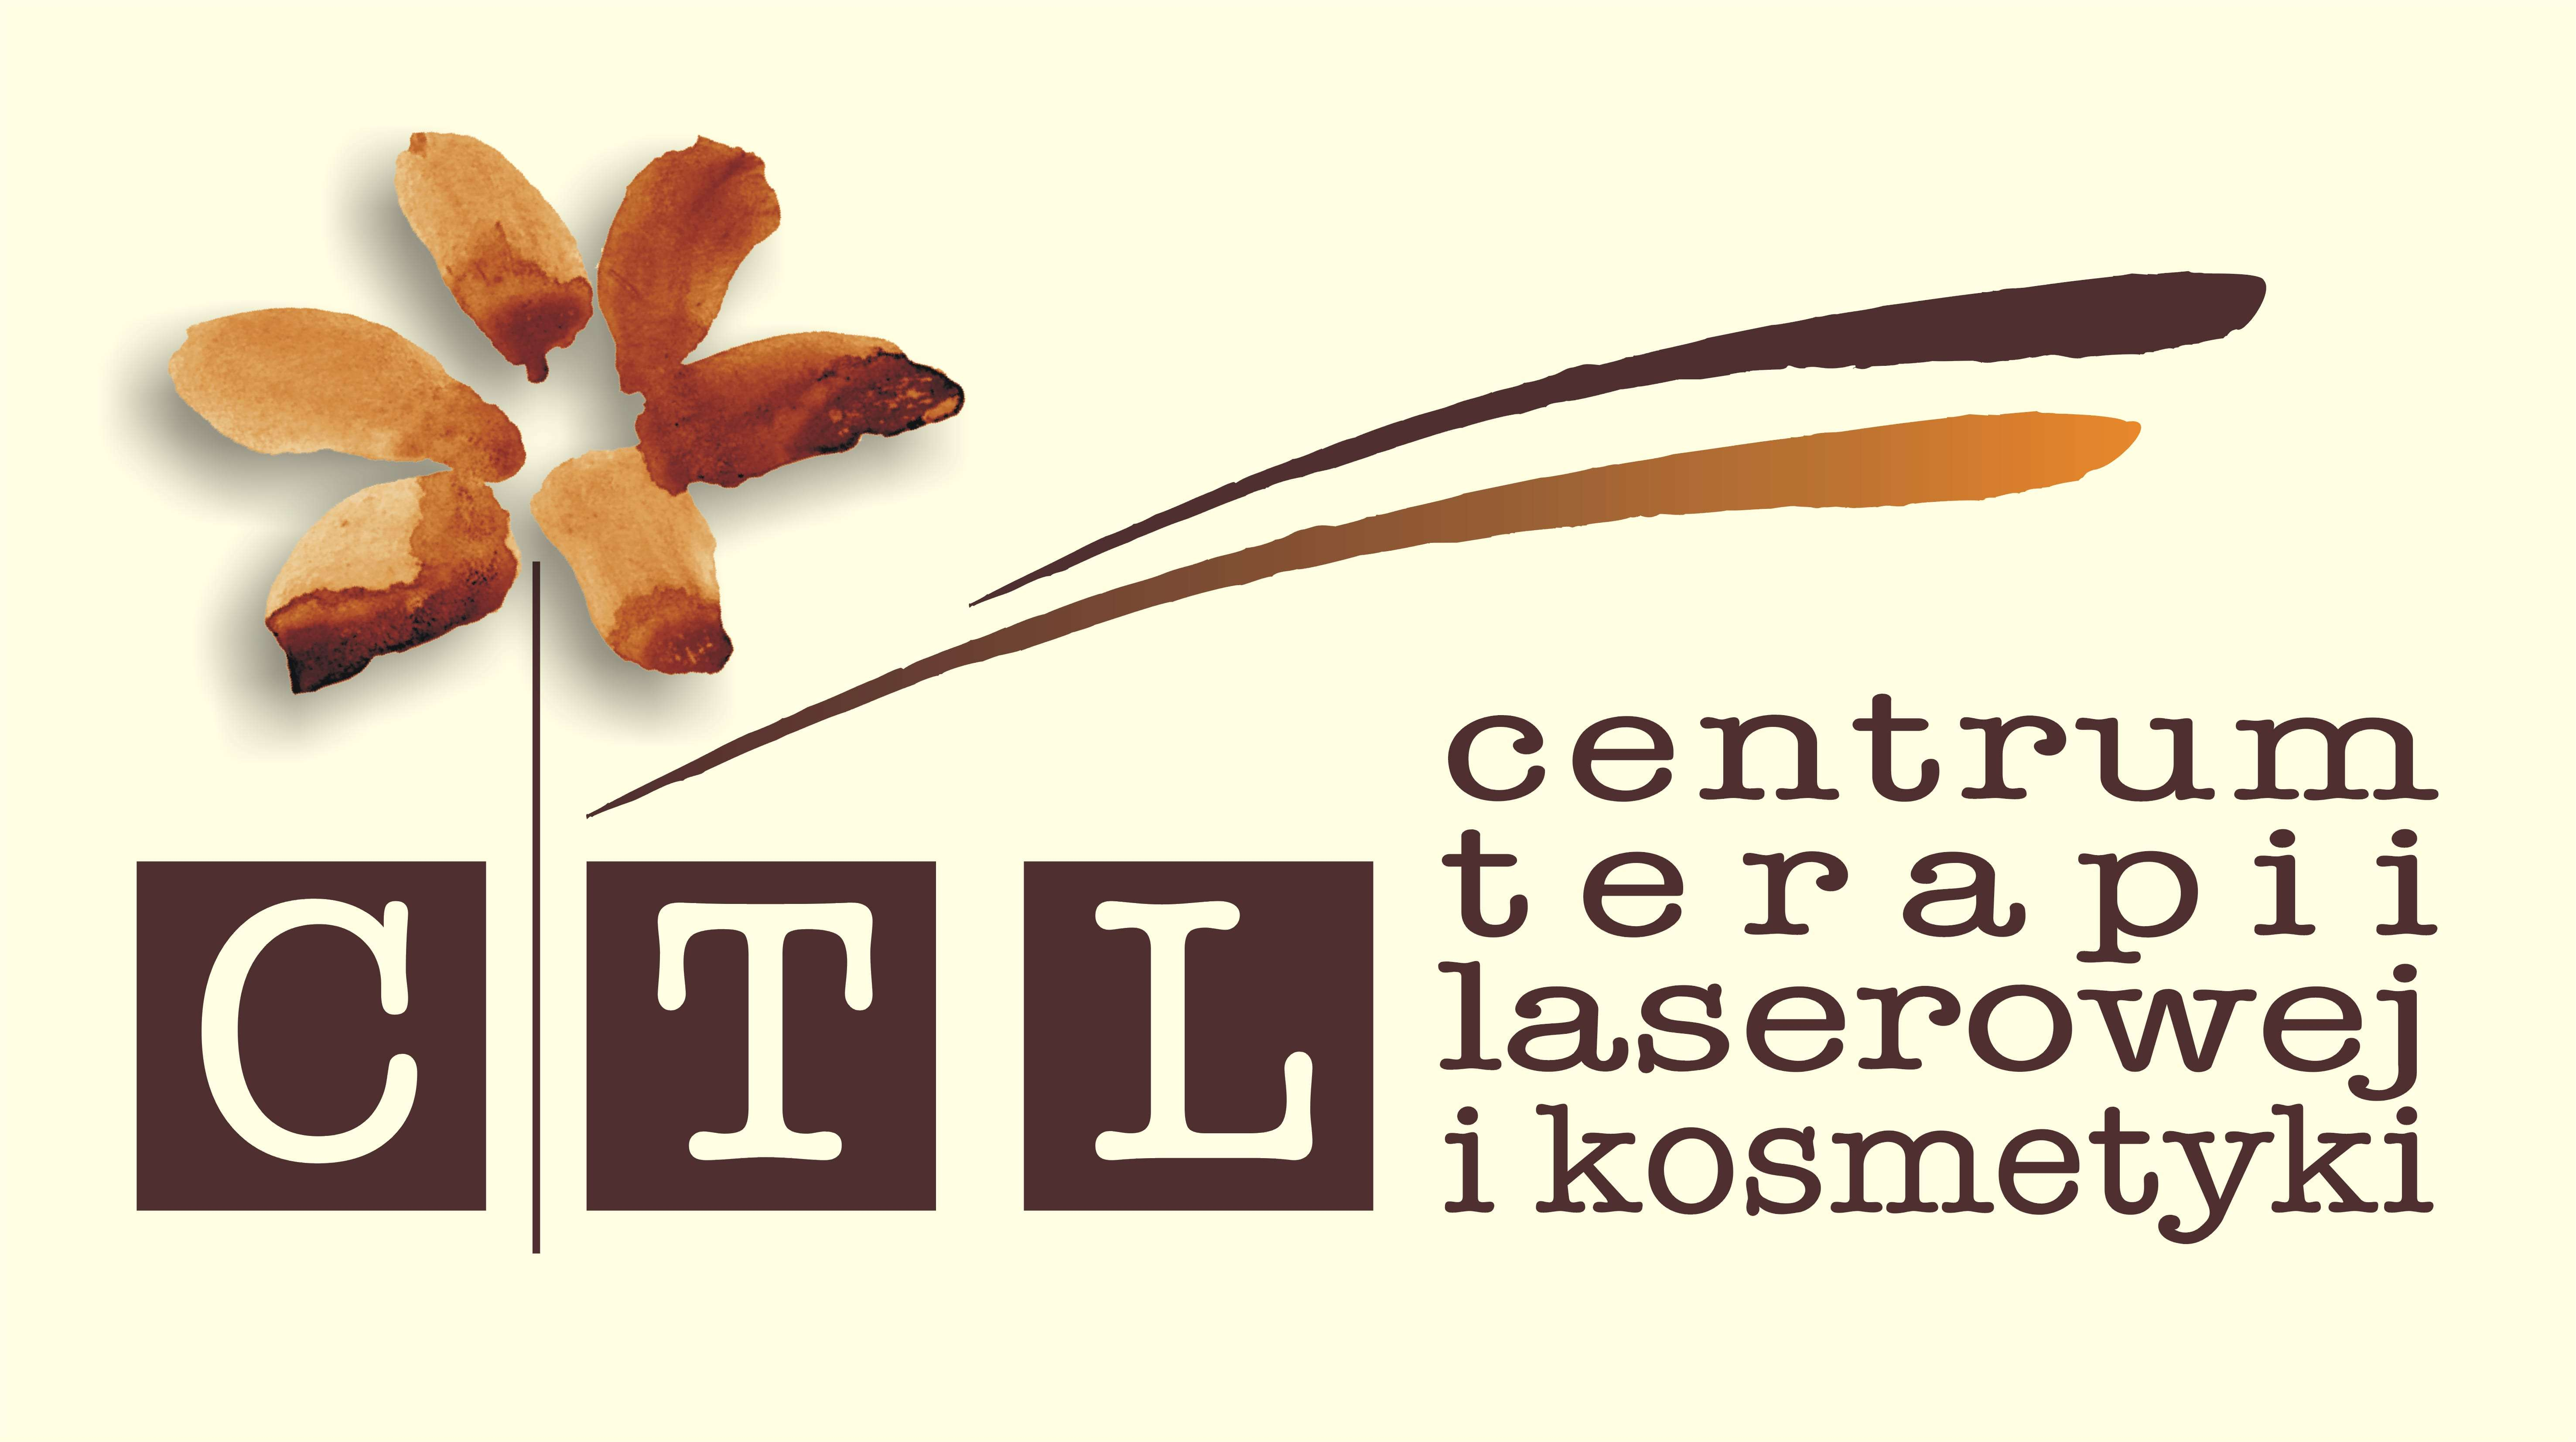 CTL_logo_i_kosmetyki